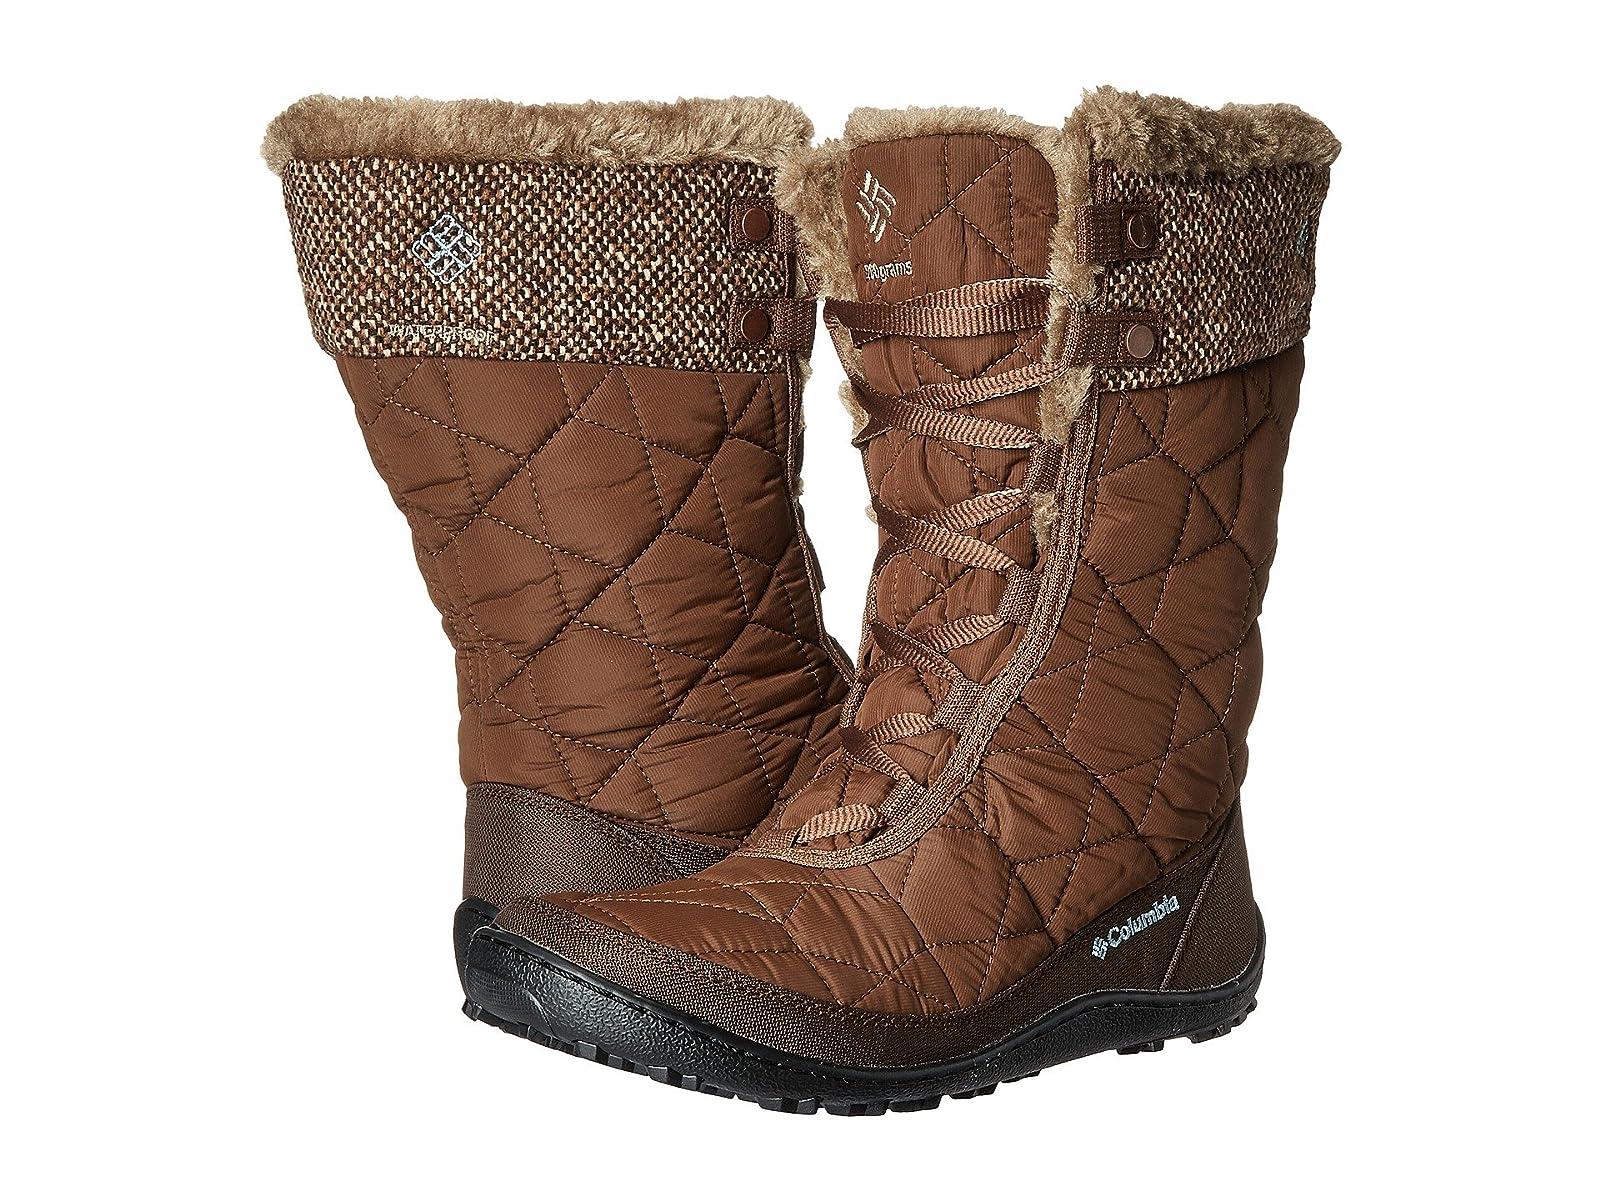 Columbia Minx Mid II Omni-Heat WovenCheap and distinctive eye-catching shoes